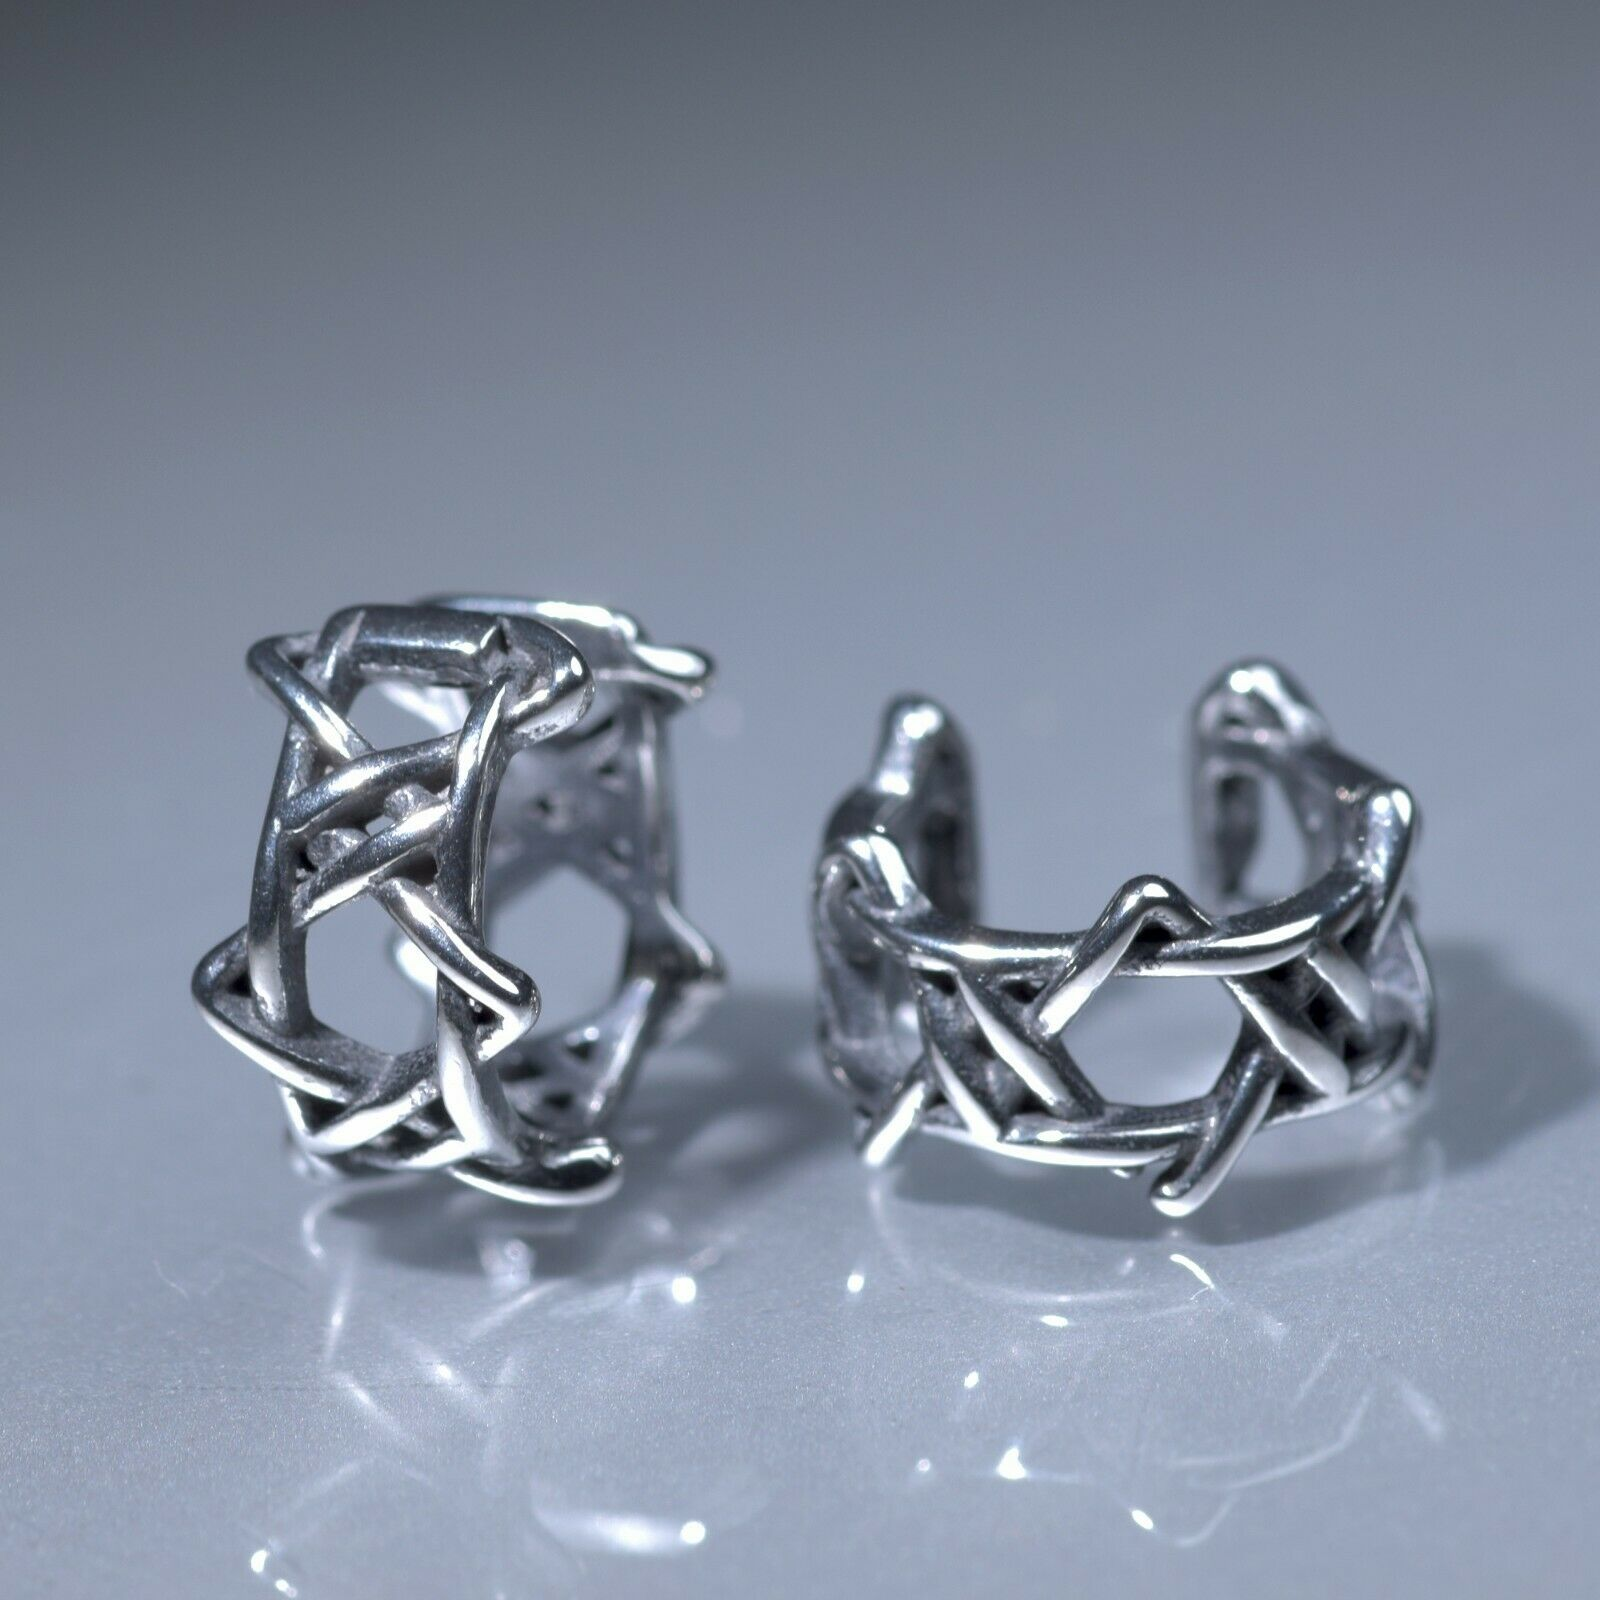 Silver stud star of David pattern stainless steel earrings huggies cuff screw on